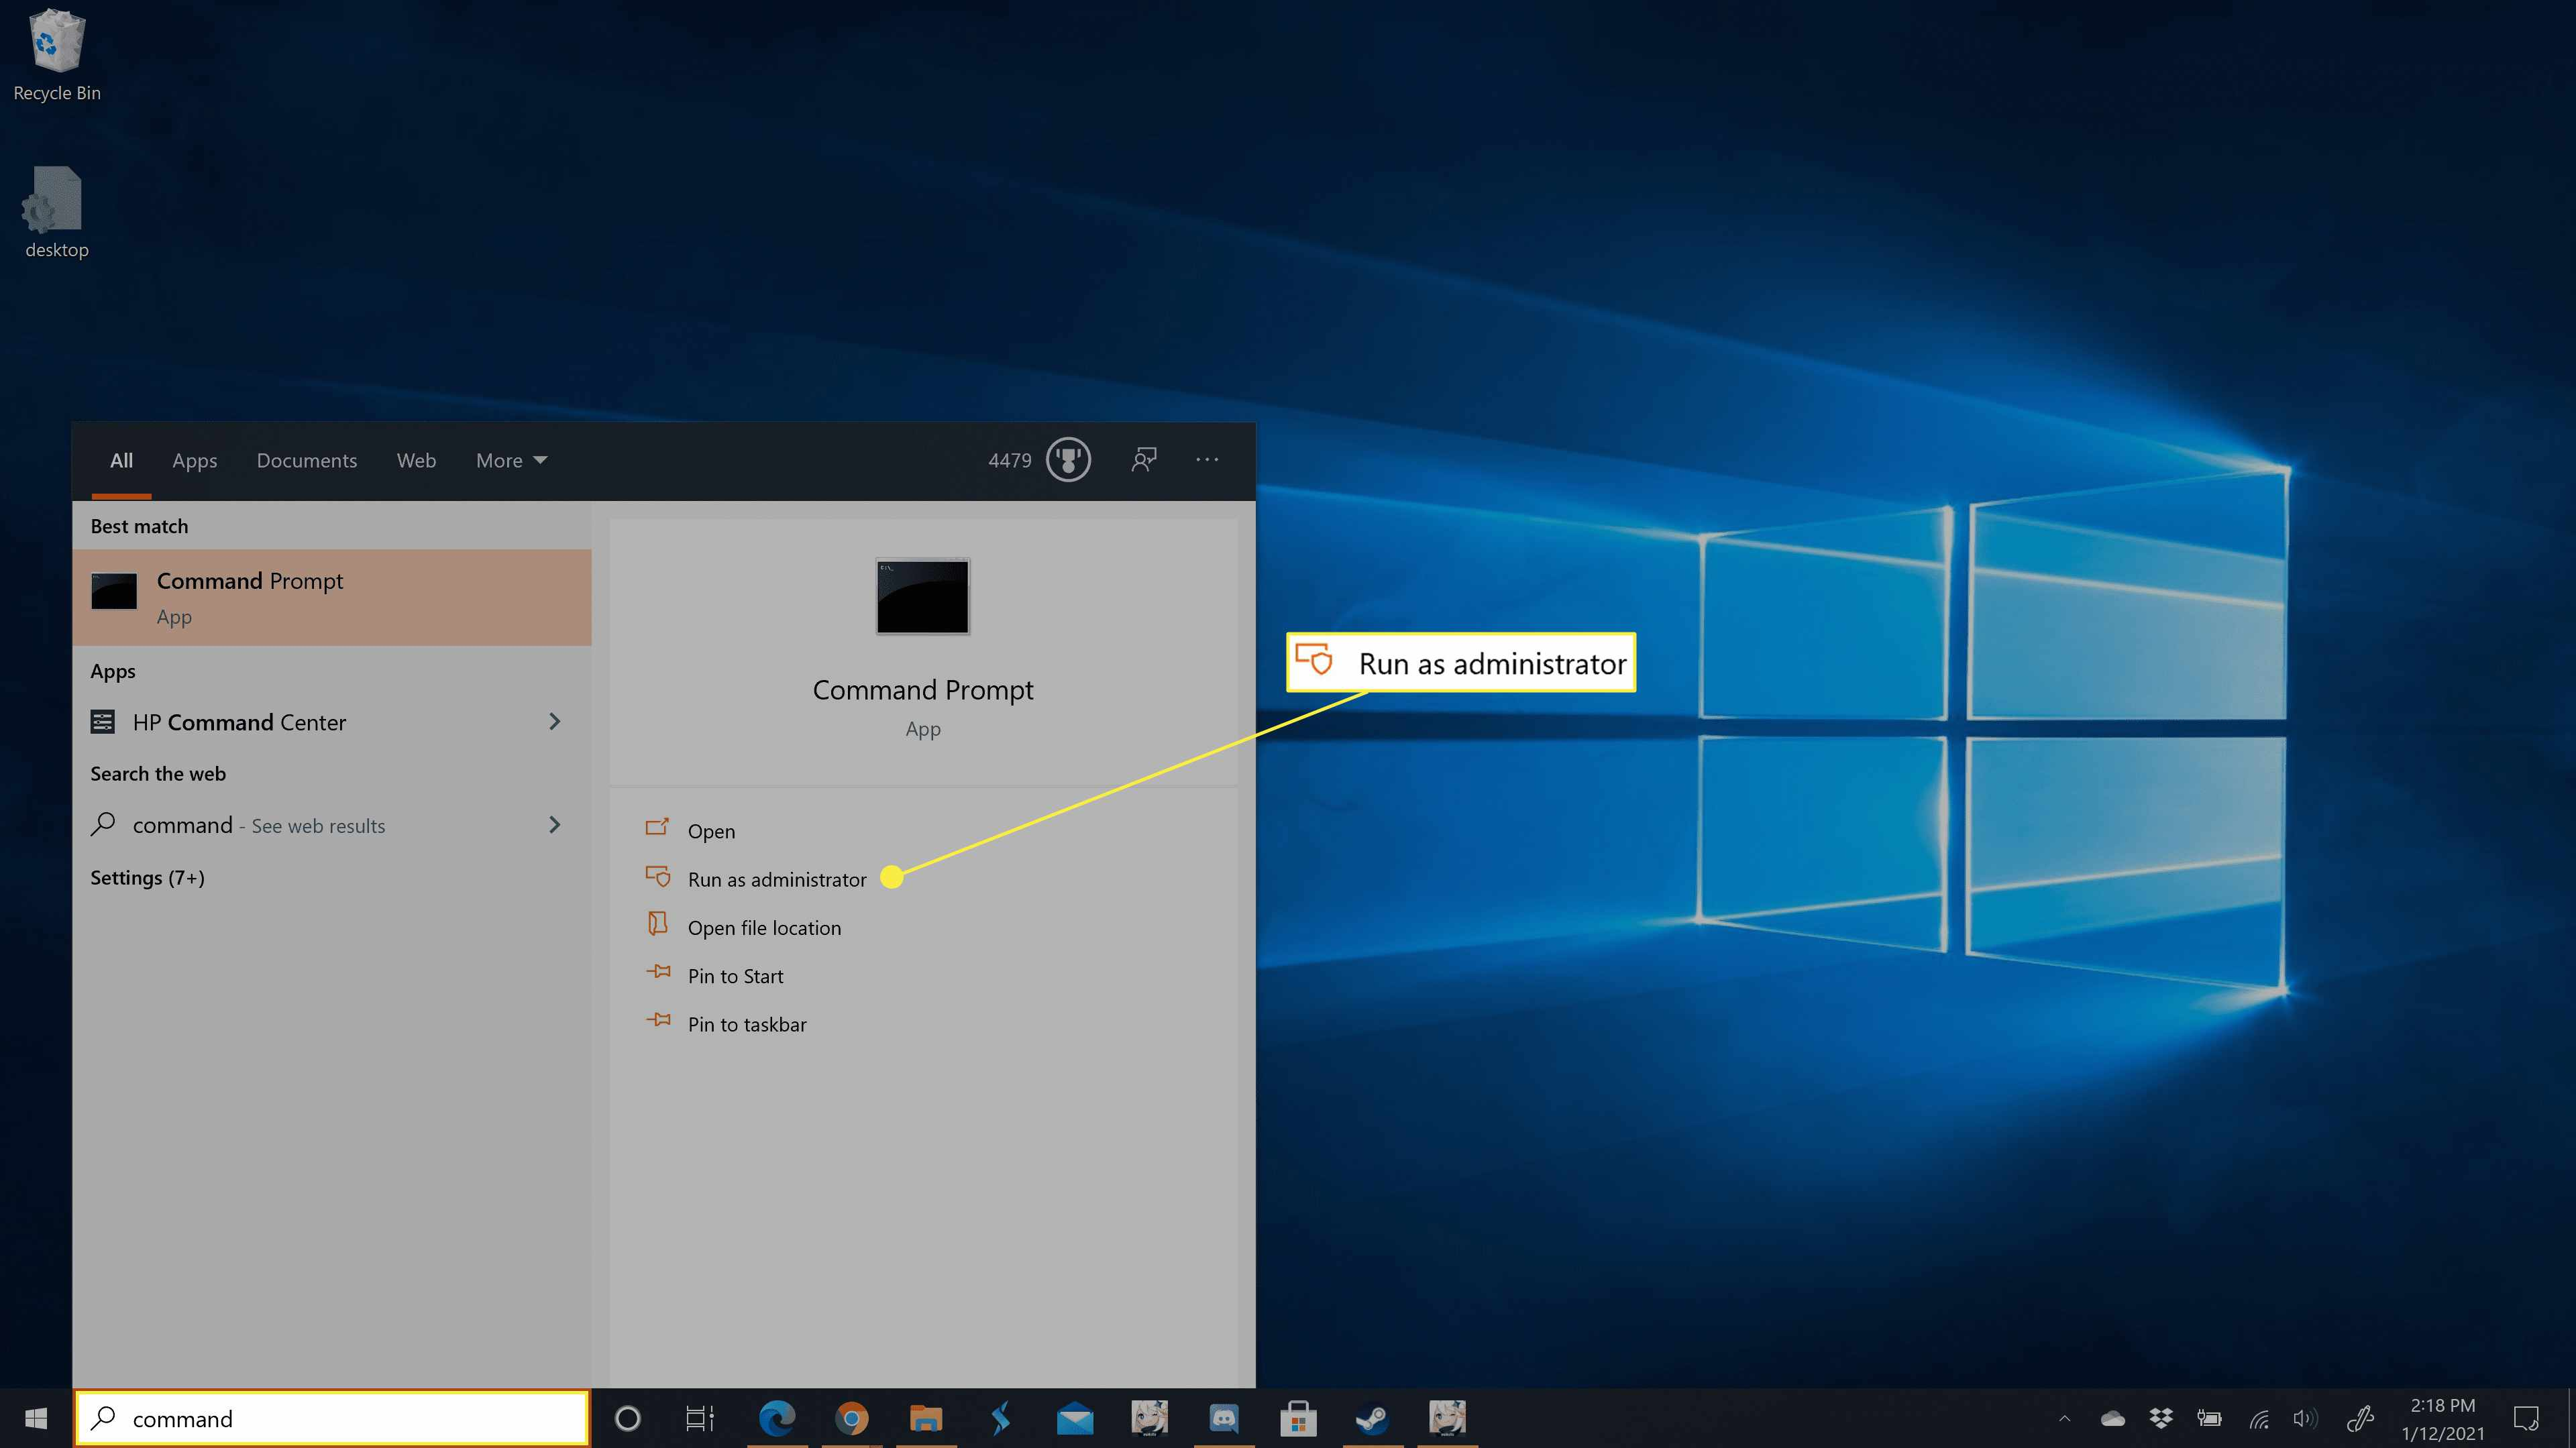 Command Prompt in the Windows 10 Taskbar search.